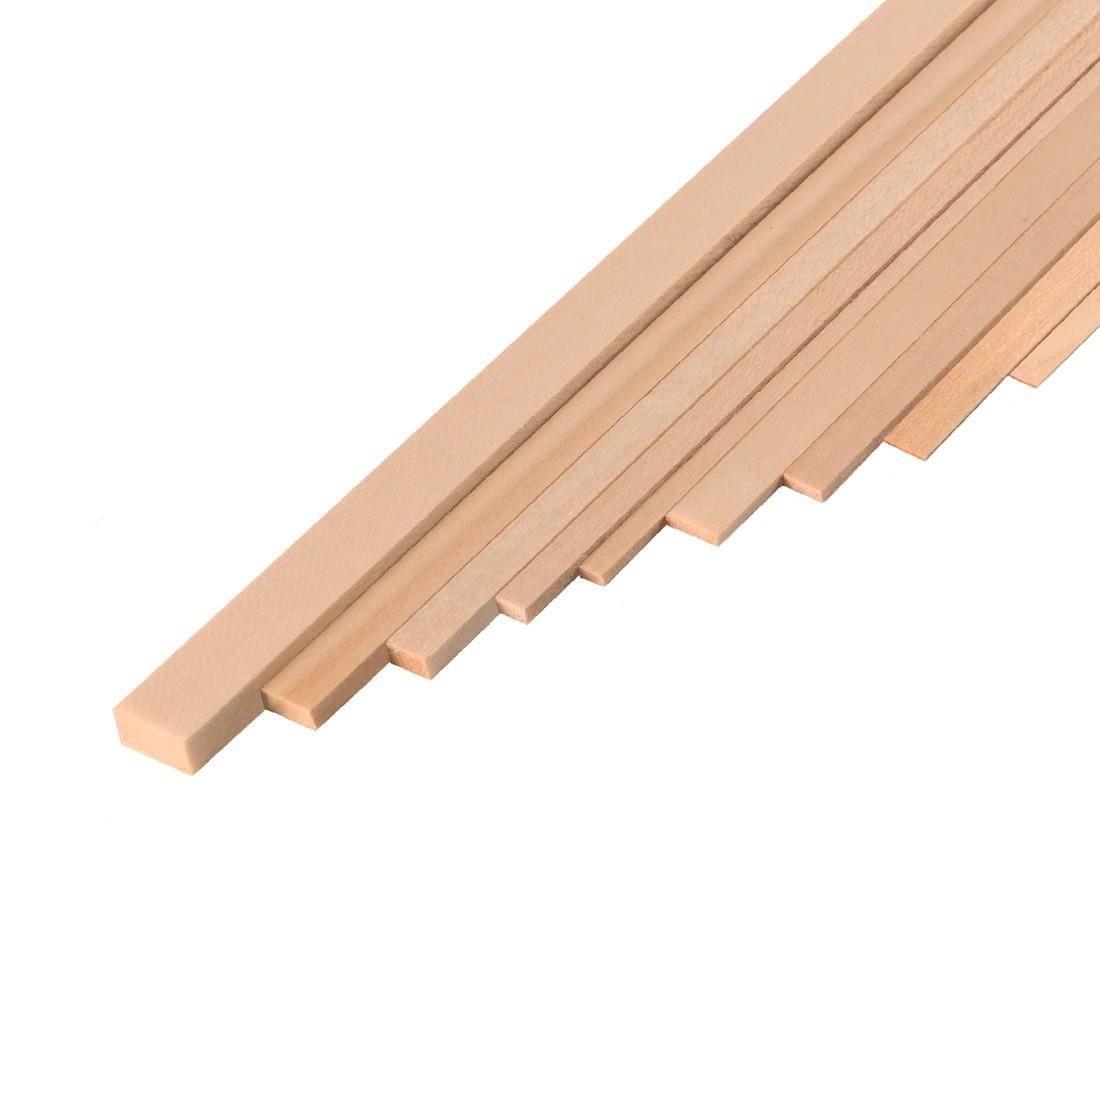 Limewood strip mm.0,5x8